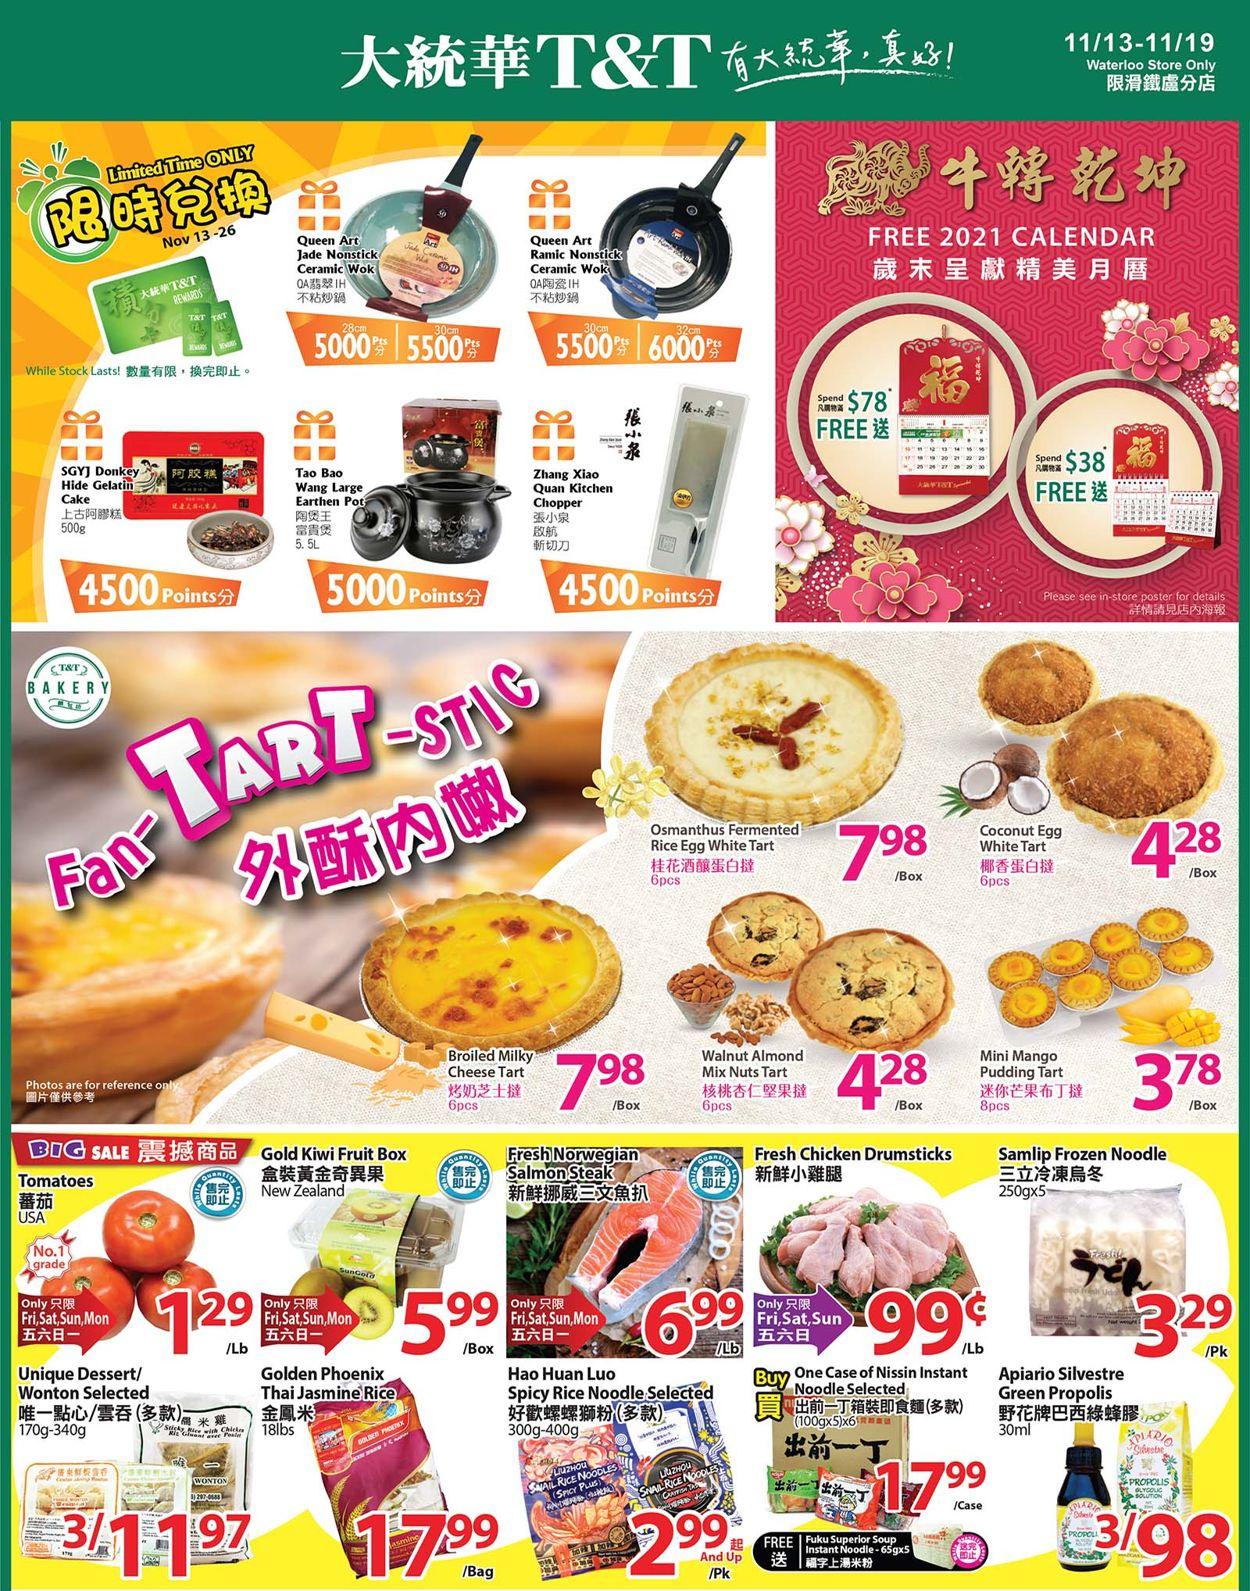 T&T Supermarket - Waterloo Flyer - 11/13-11/19/2020